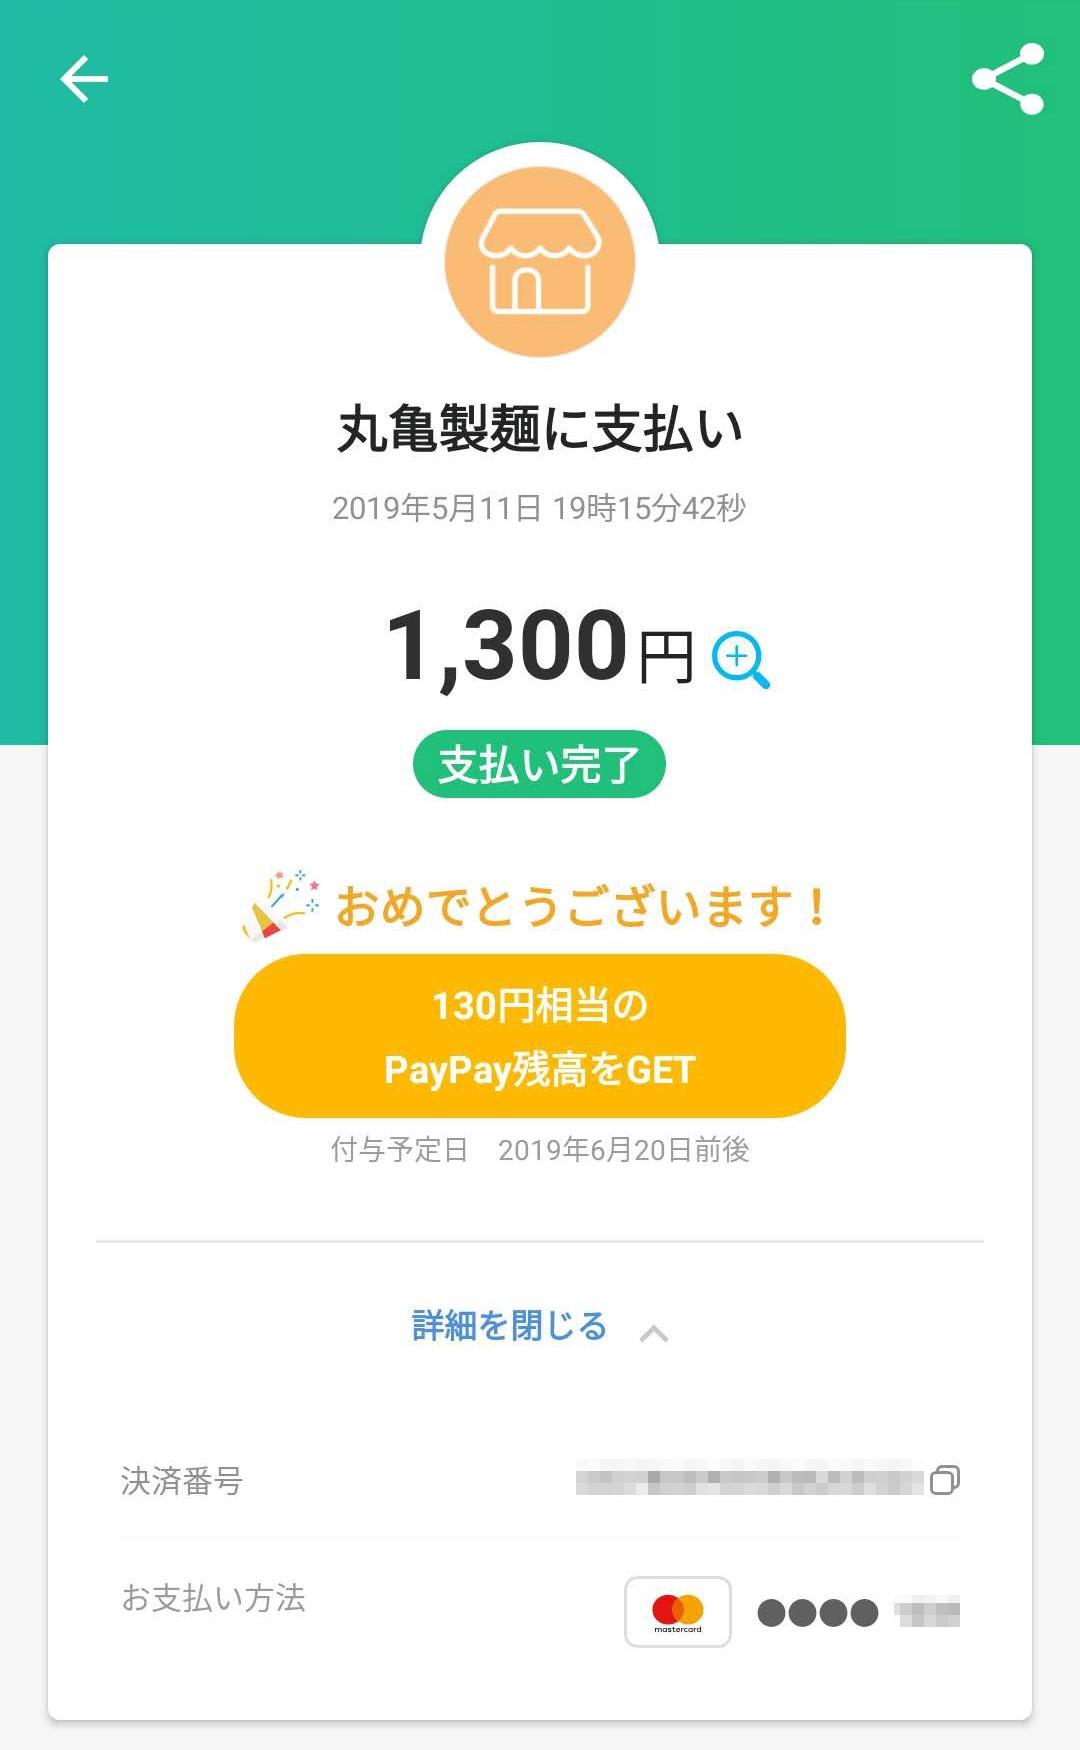 PayPayお得